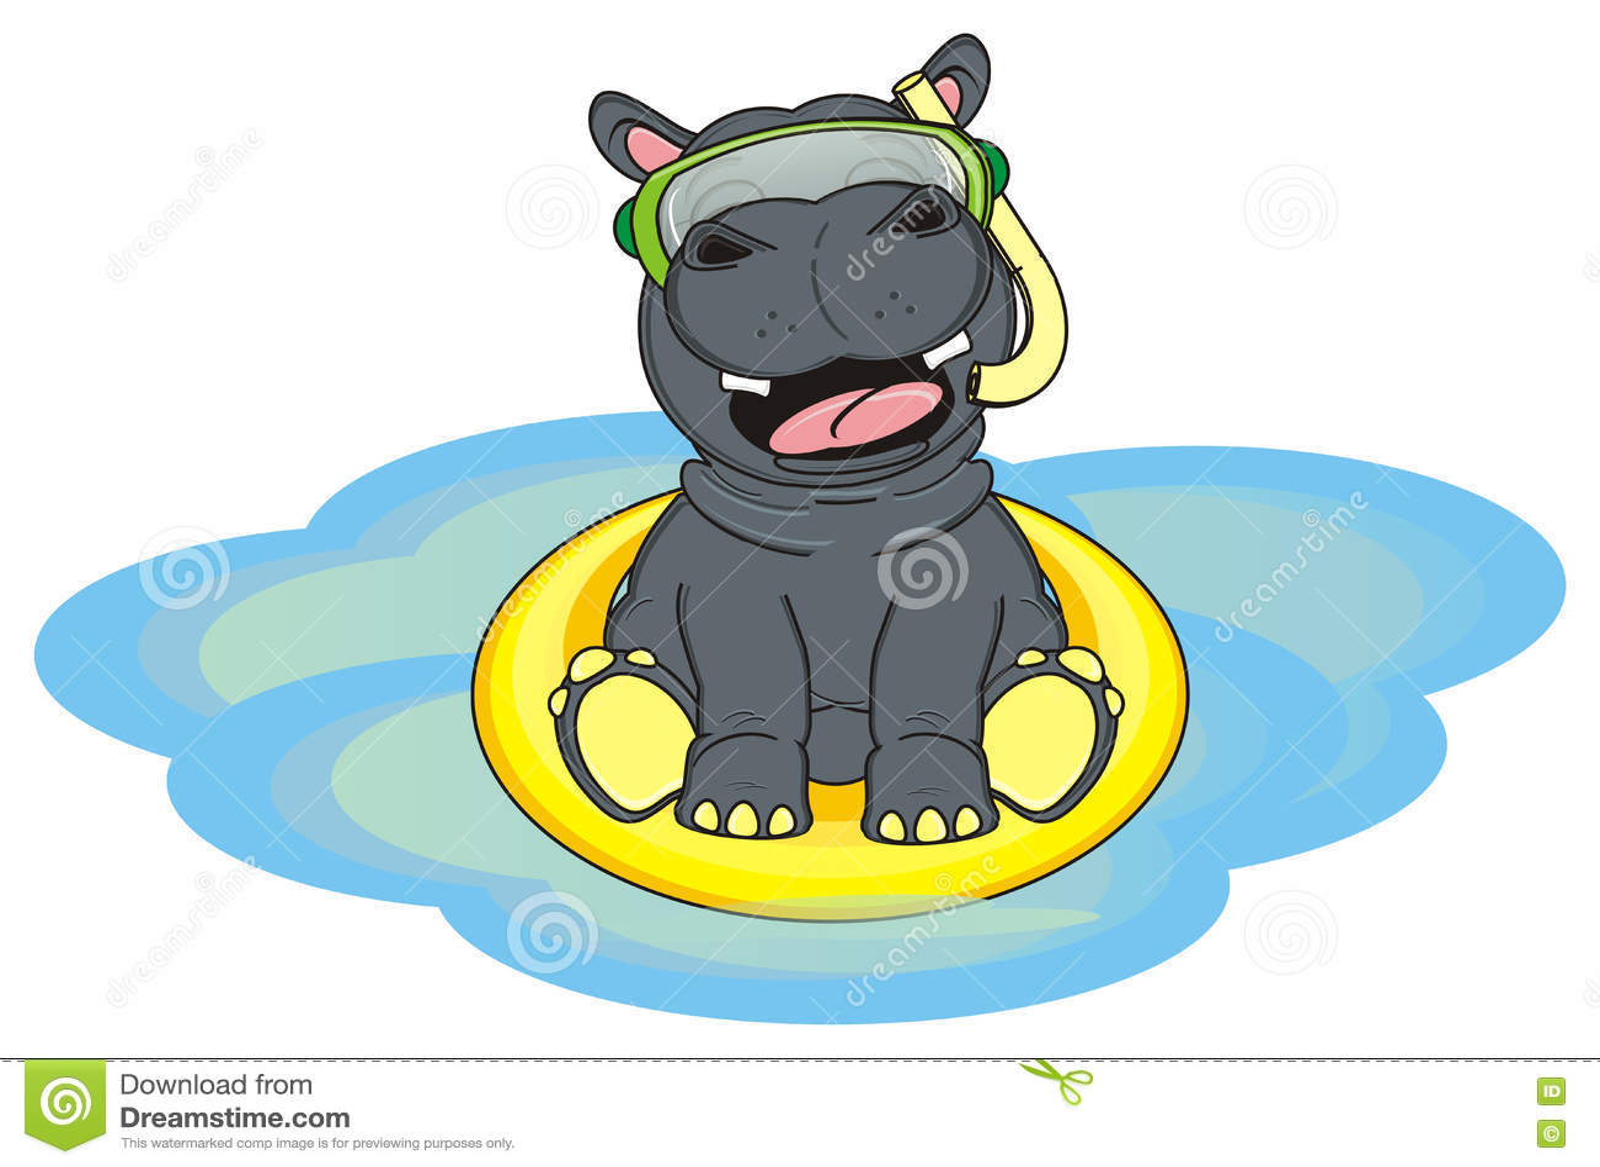 Heure Heureuse Pour Lhippopotame Heureux Illustration Stock